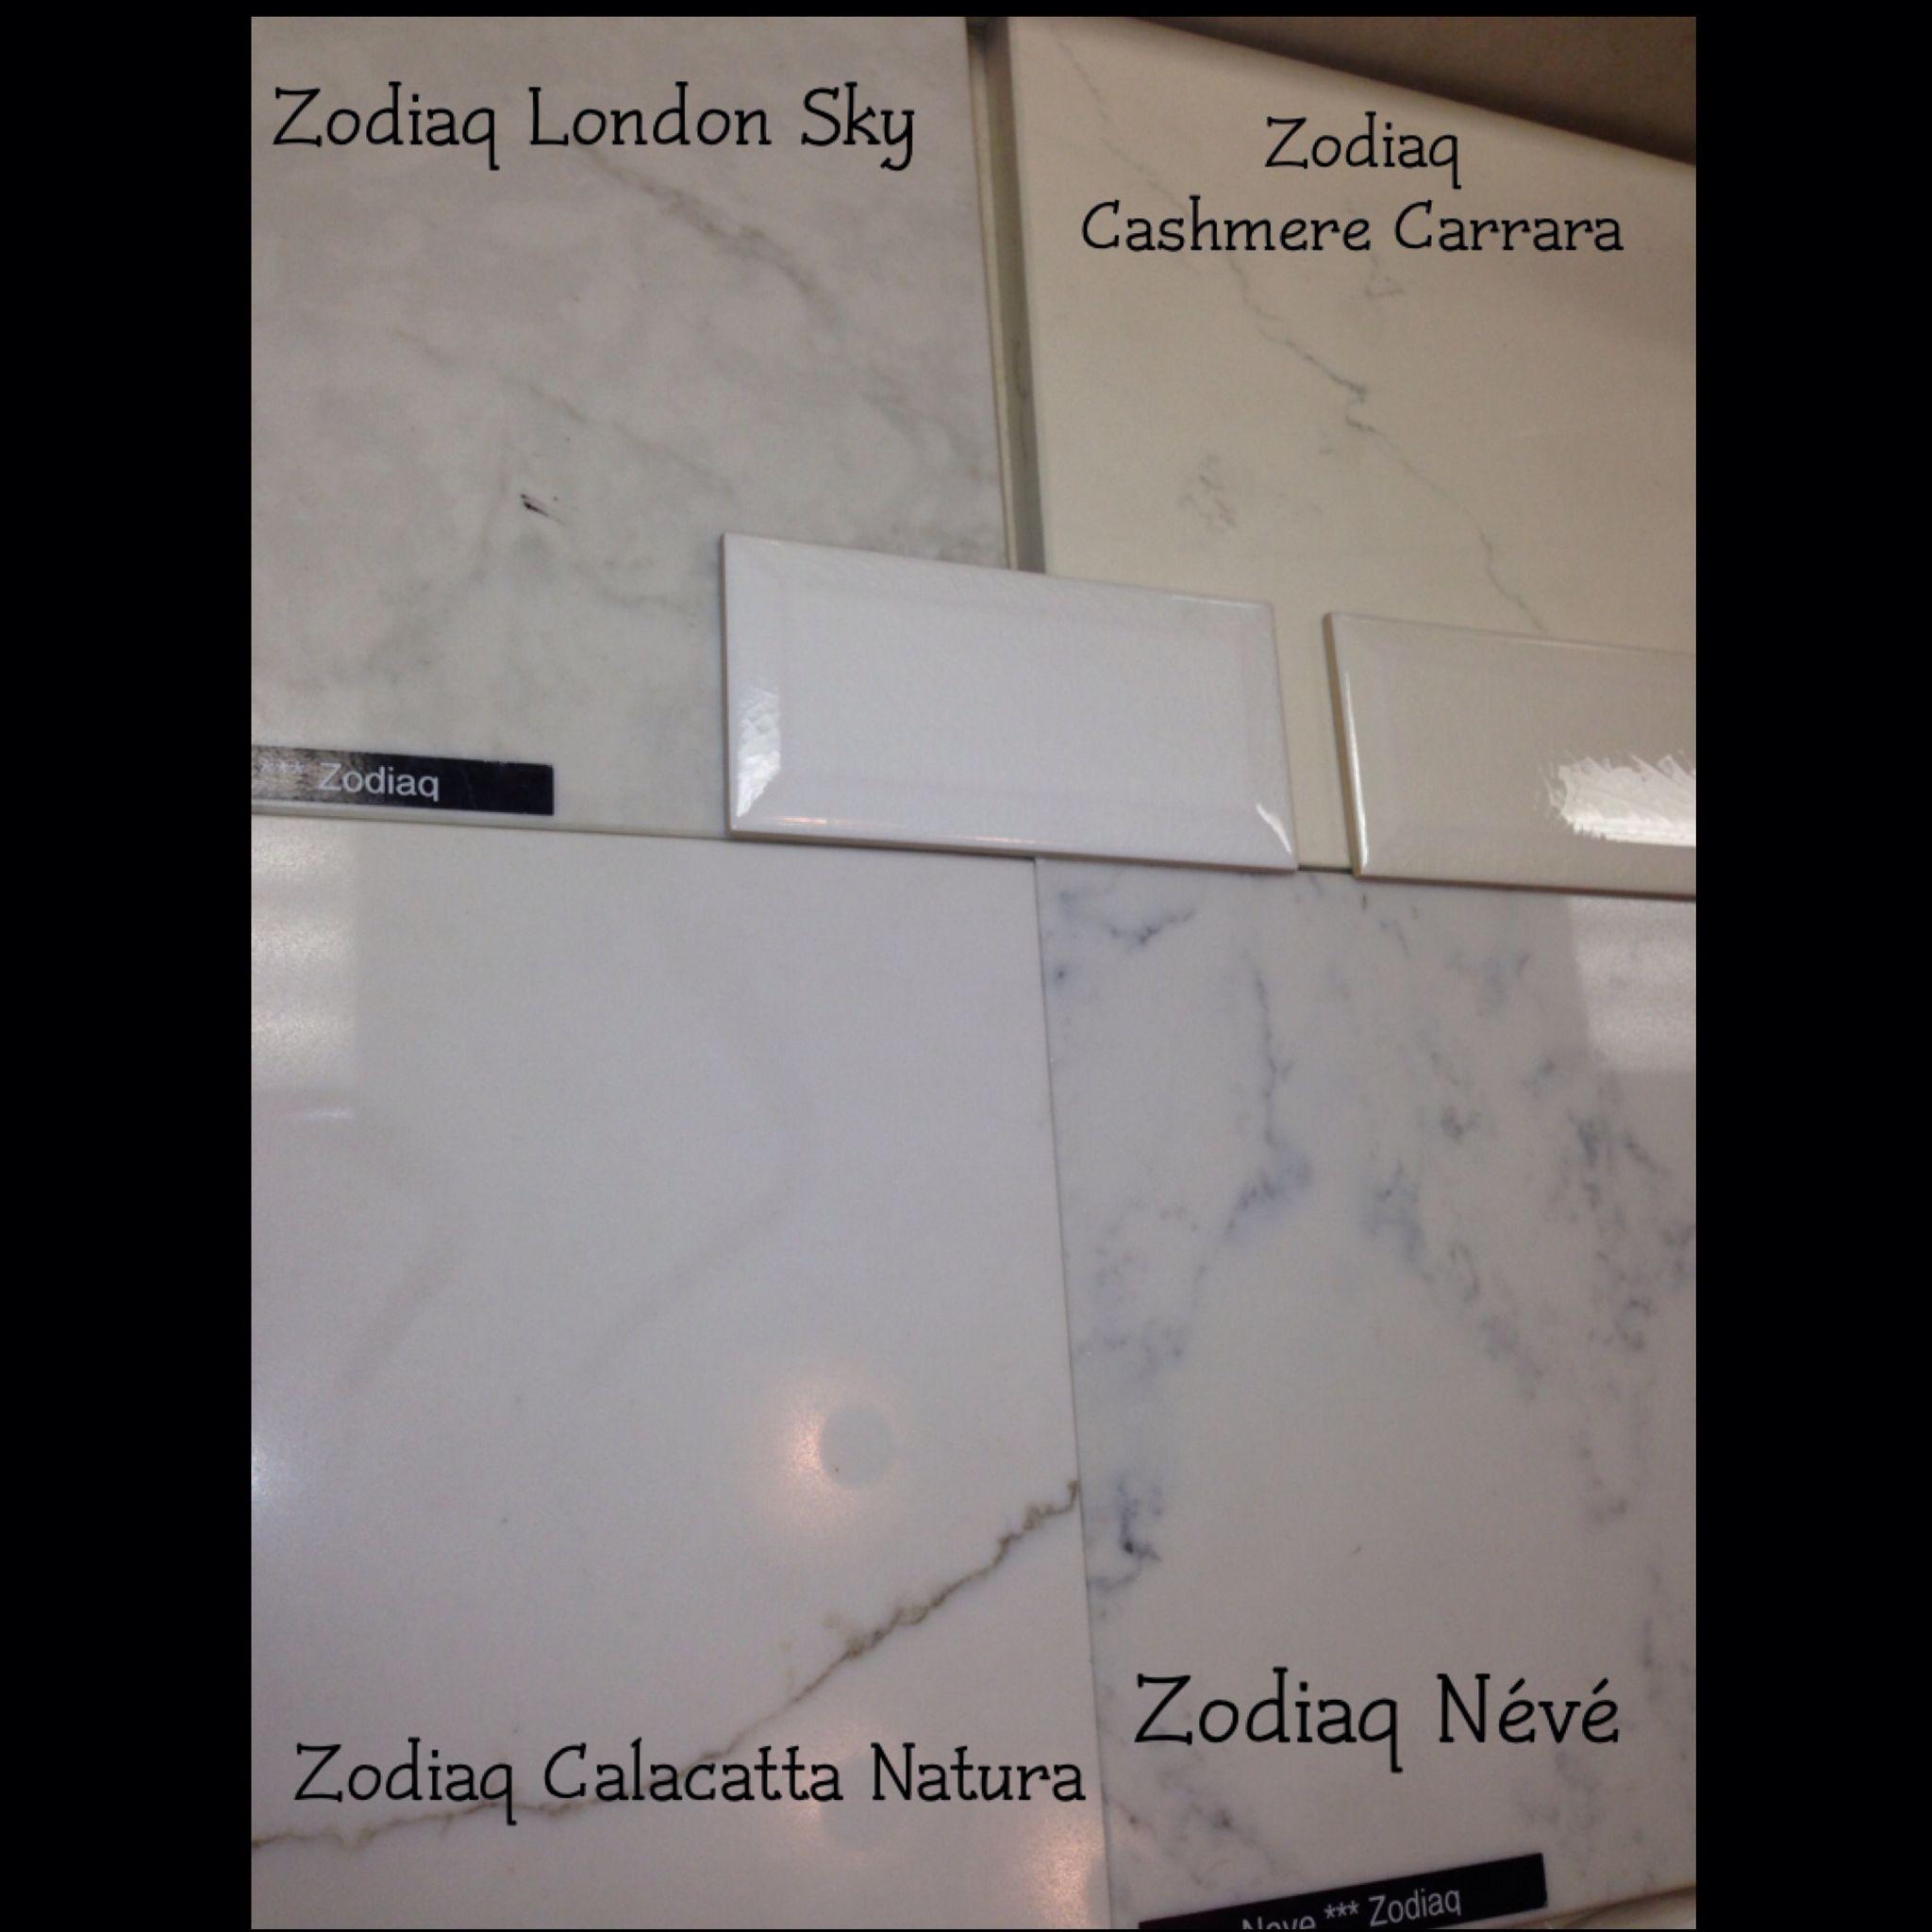 Duponts zodiaq quartz coutertop samples london sky cashmere carrara calacatta natura névé